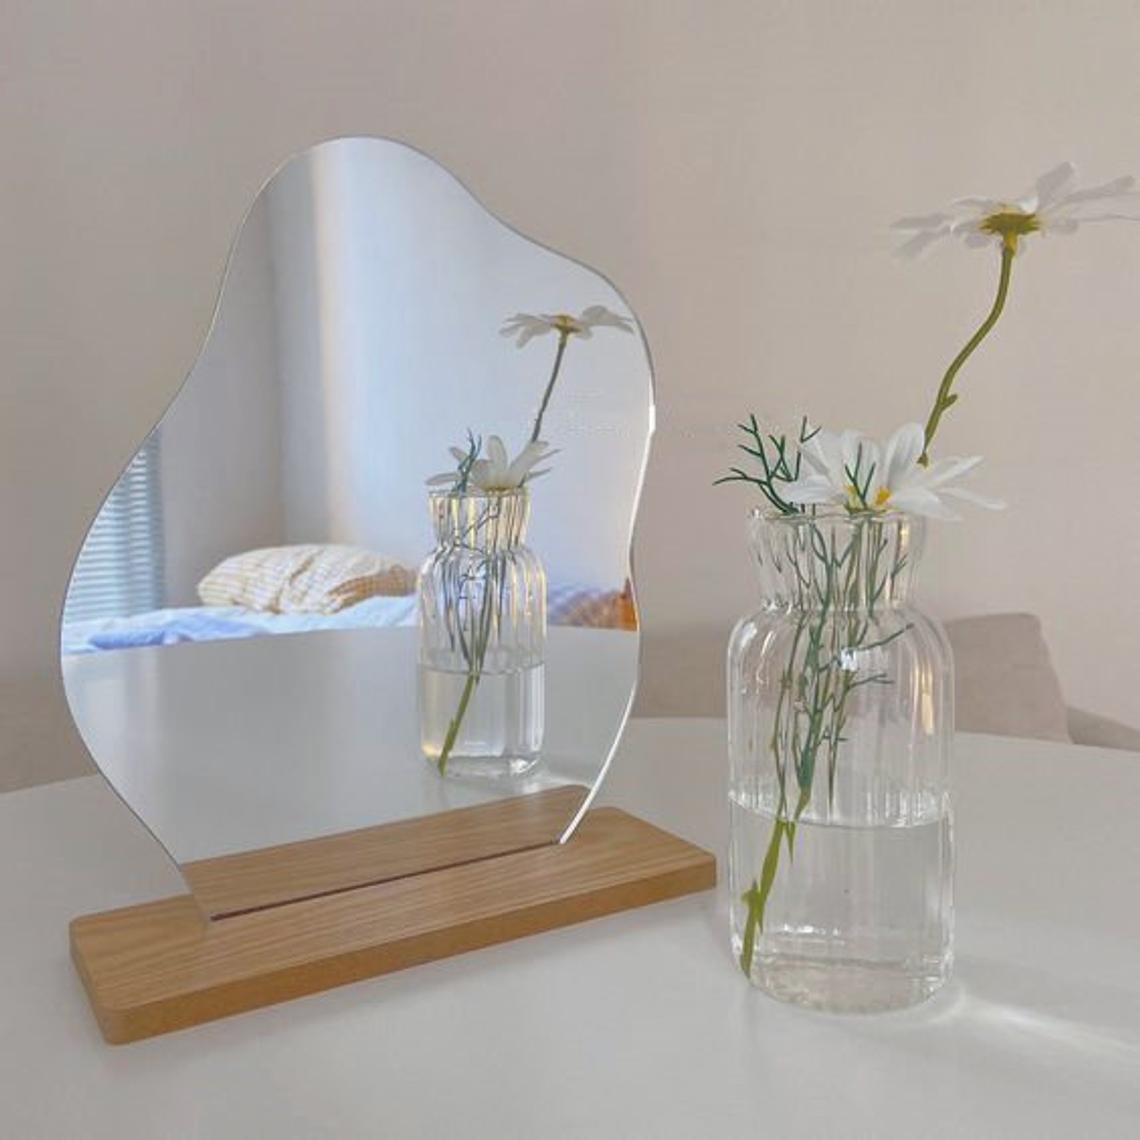 Korean style Makeup Mirror Ins Irregular Acrylic Decorative Mirror Wooden Base Cosmetic de maquillaje Beauty Tools Dropshipping